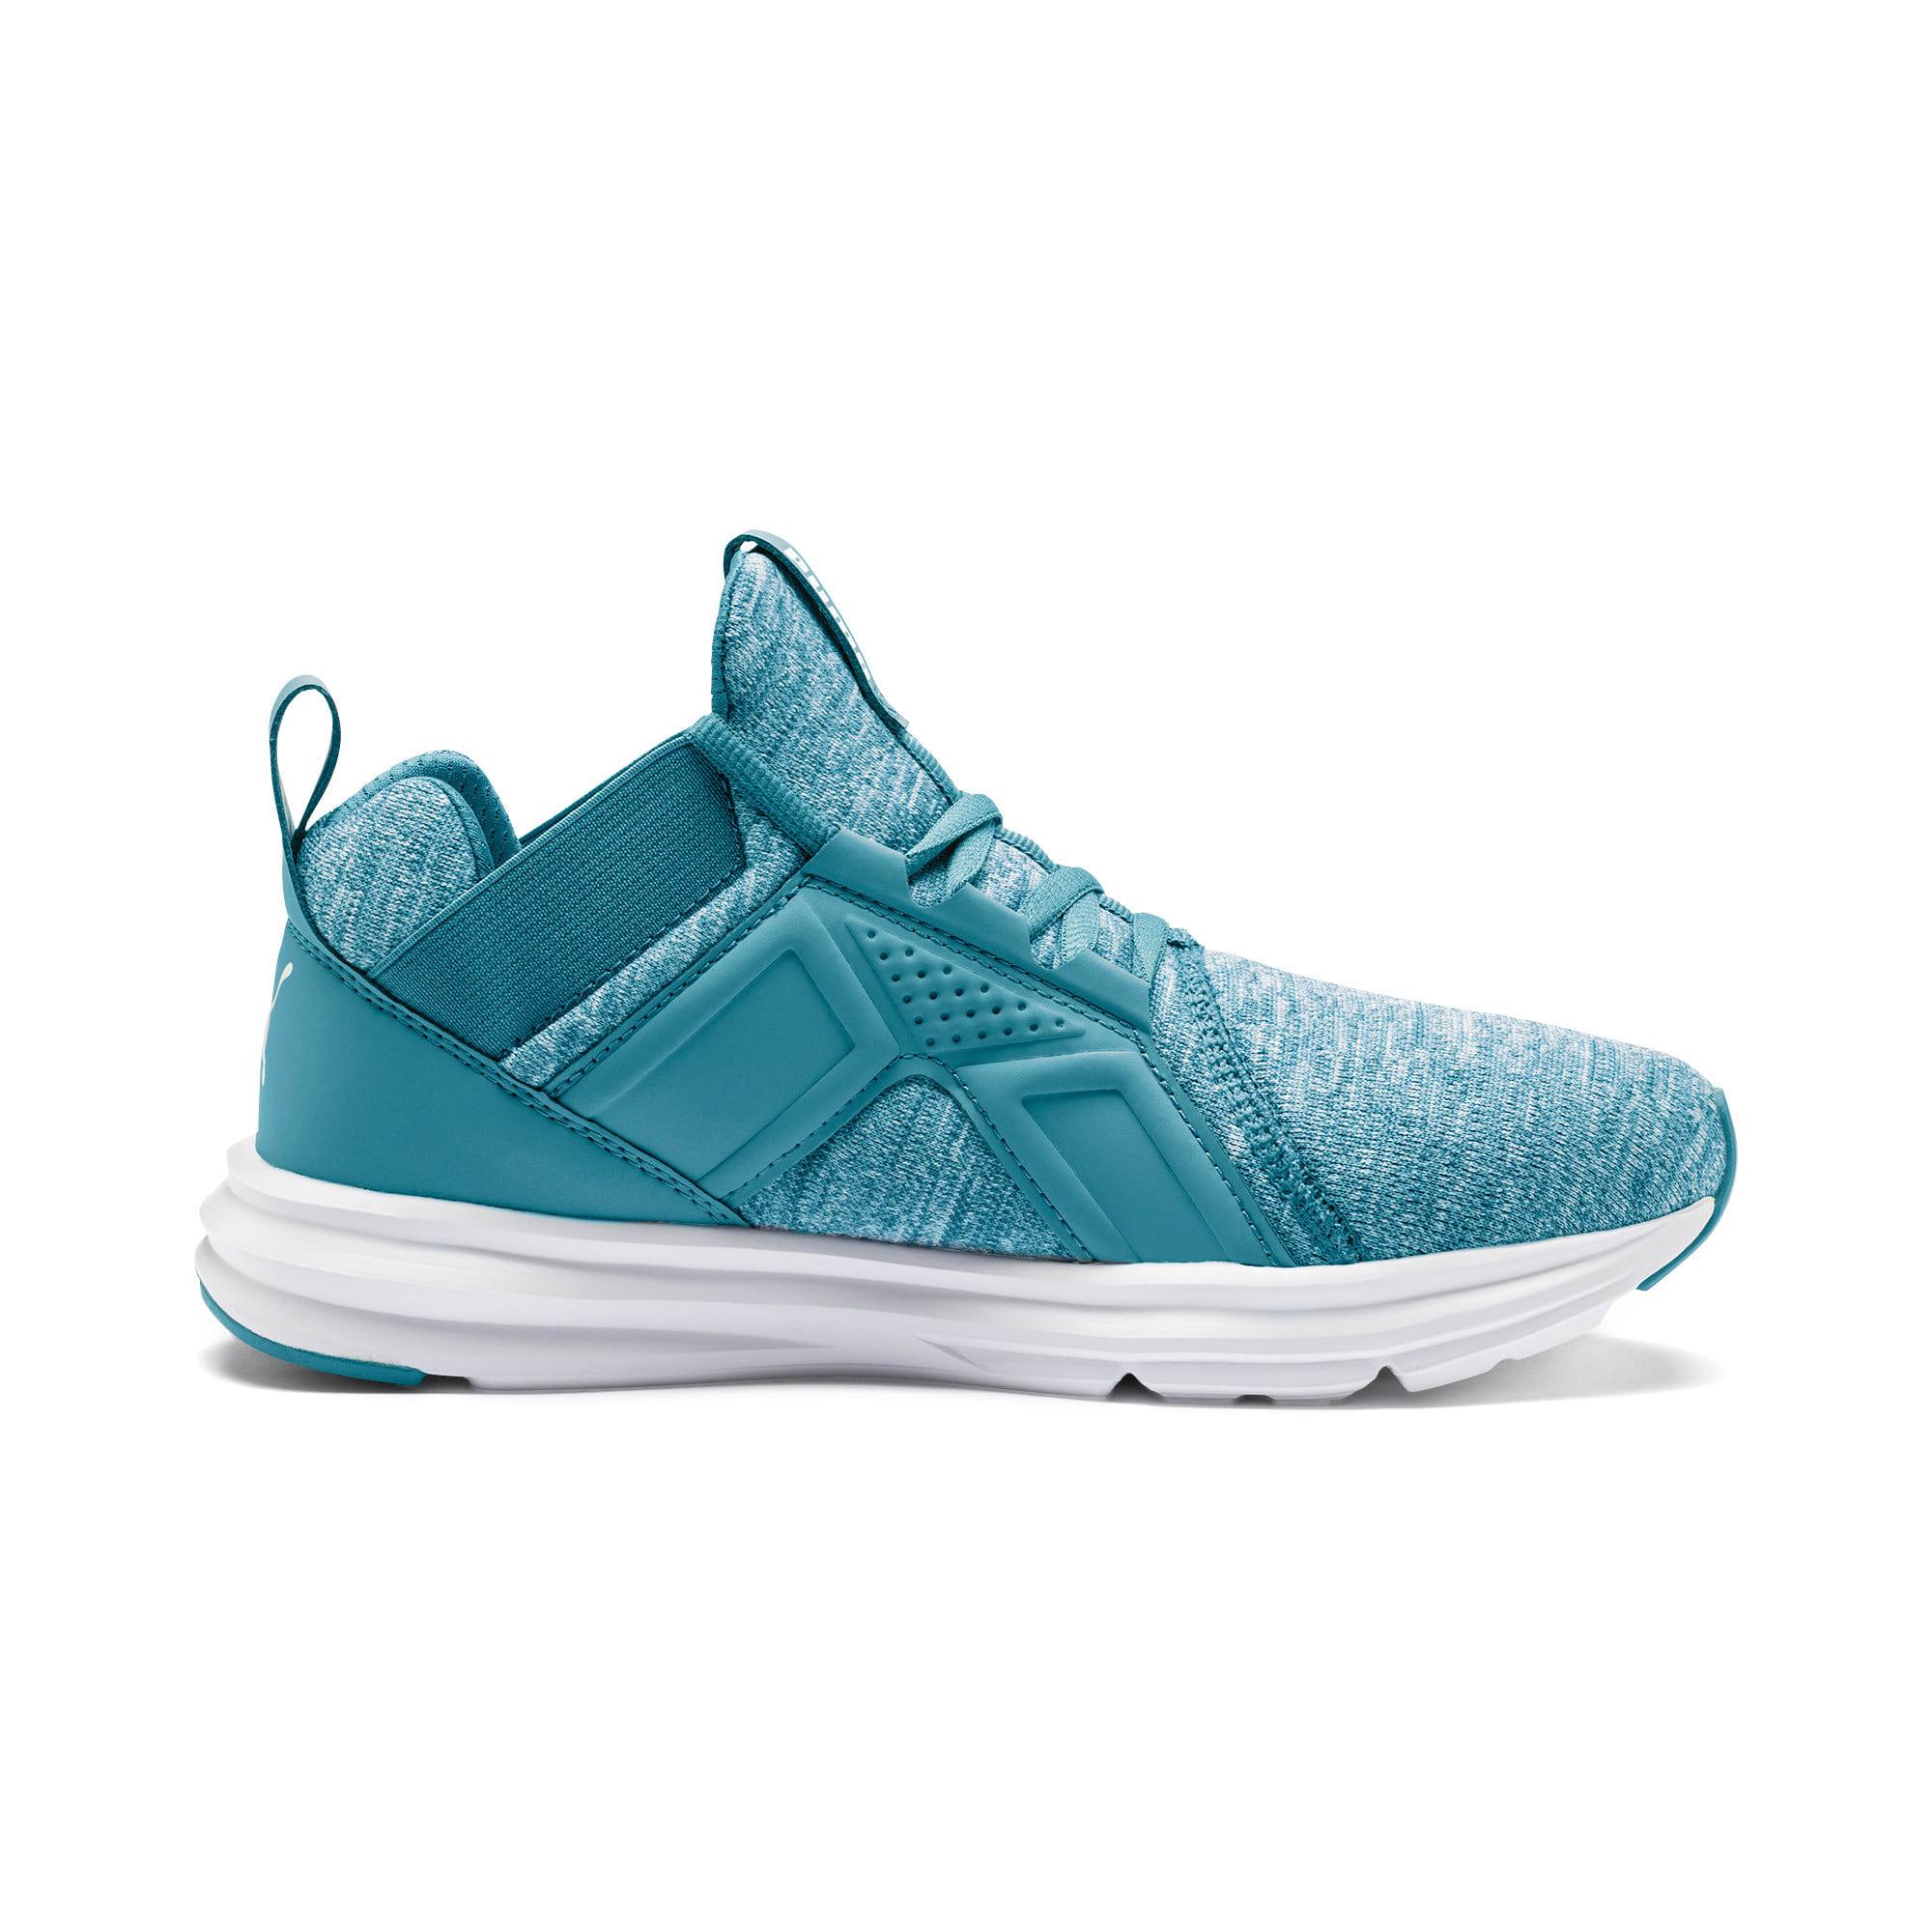 Thumbnail 6 of Enzo Heather Women's Sneakers, Bluestone-Milky Blue-White, medium